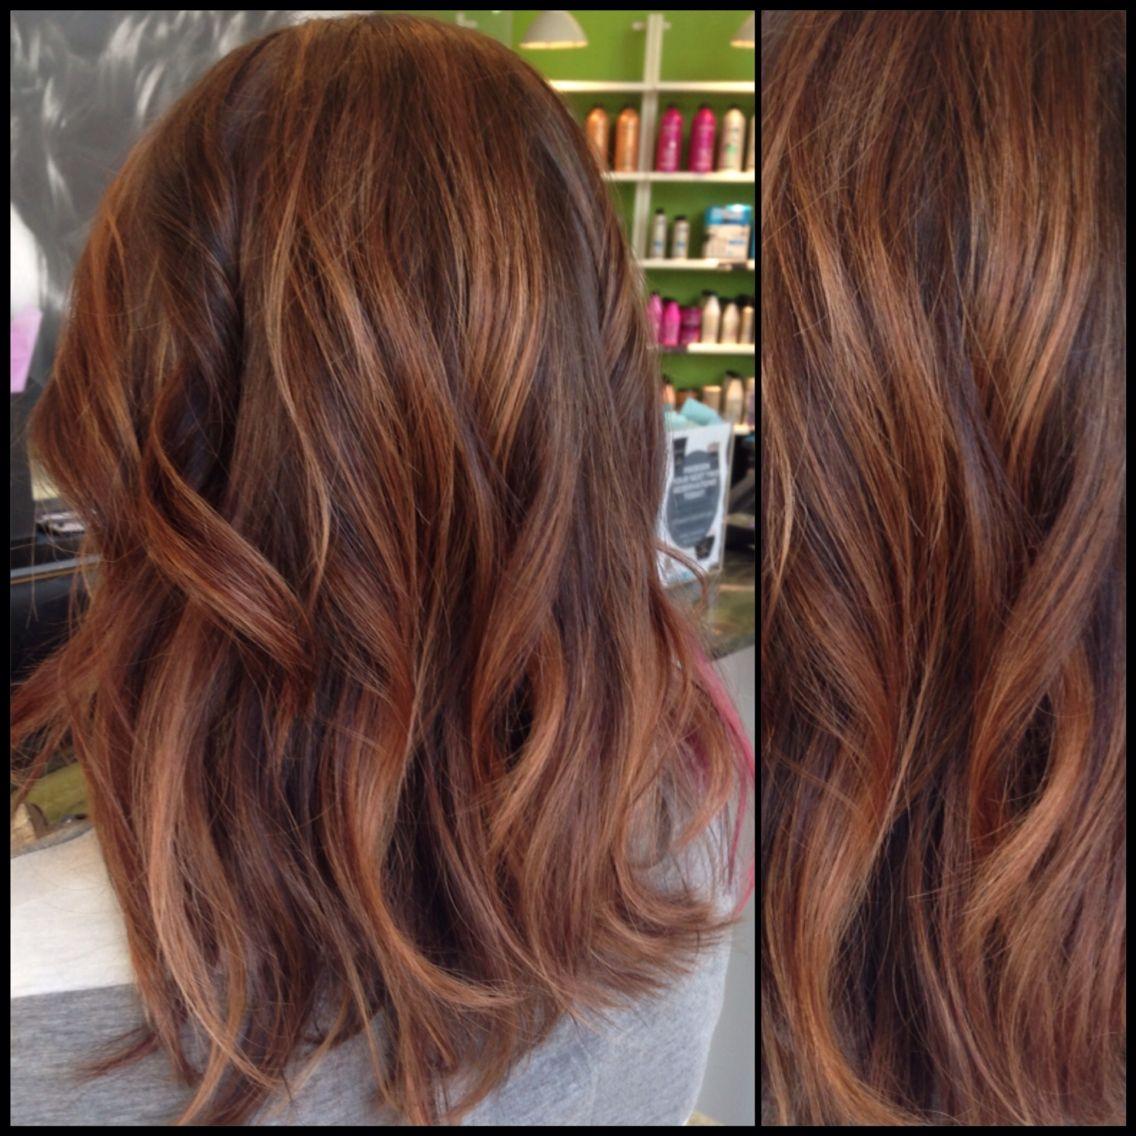 Warm Fall Brunette Balayage Hair Hair Balayage